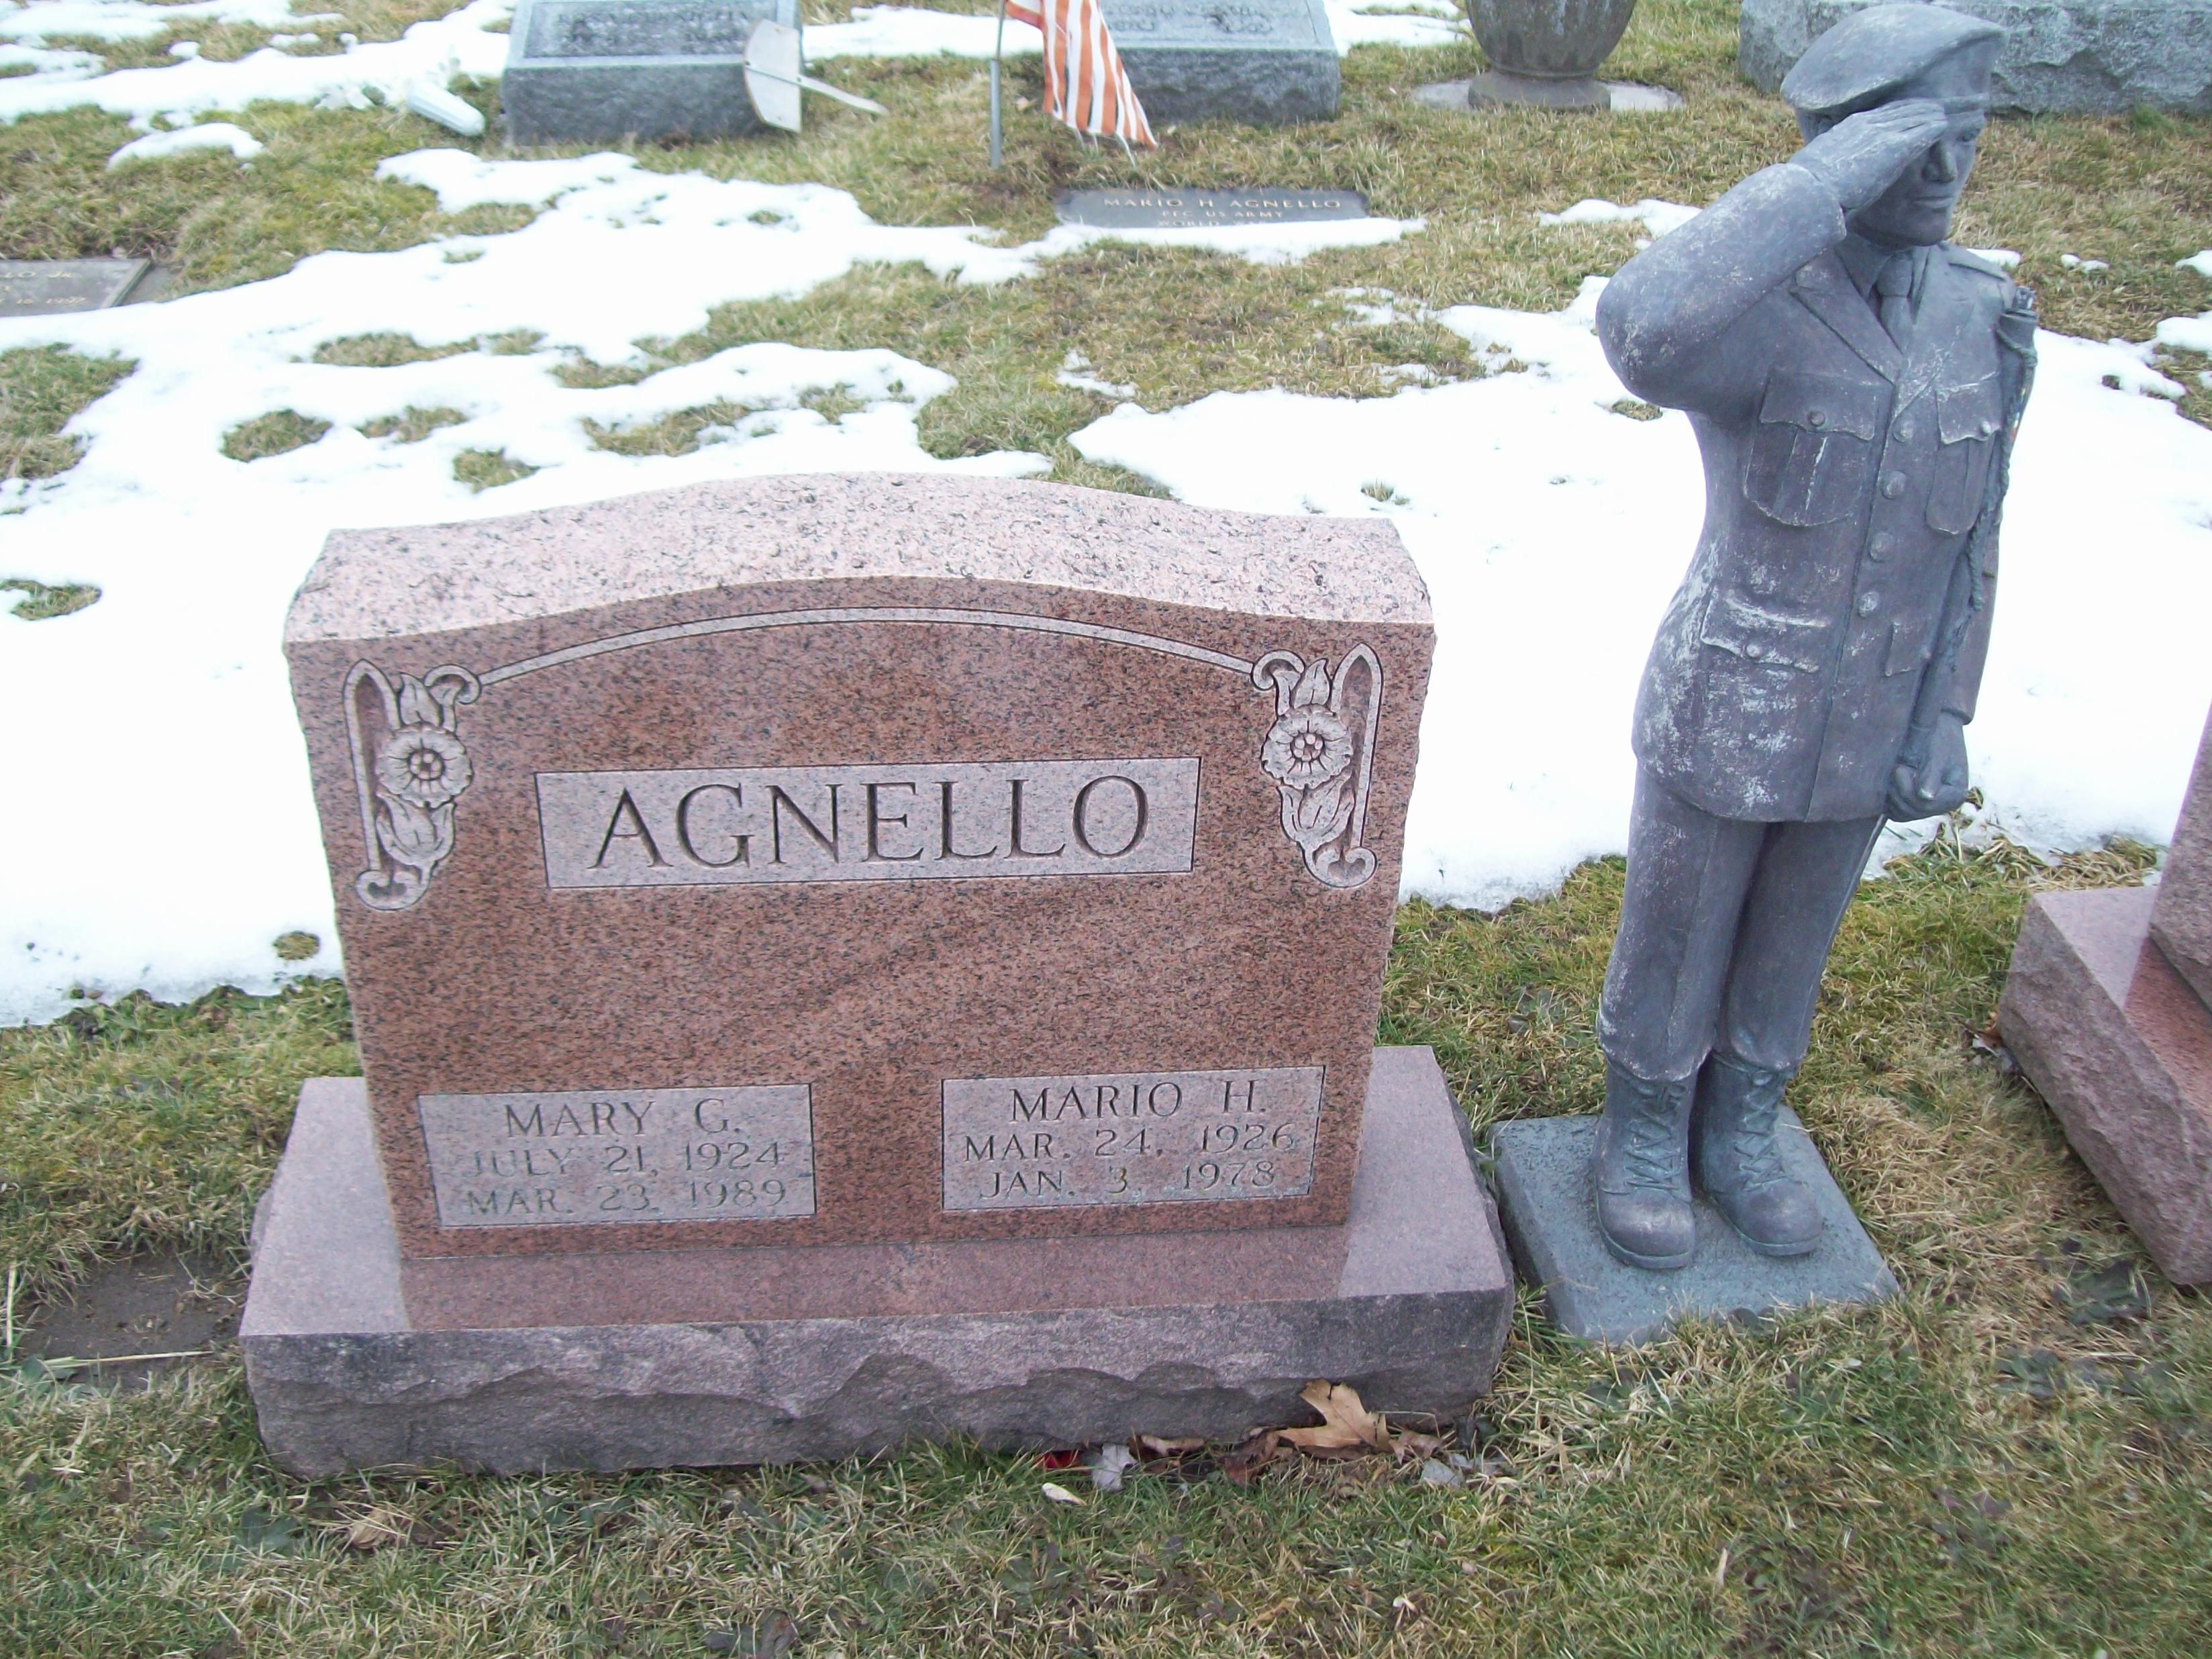 Mary G. Agnello